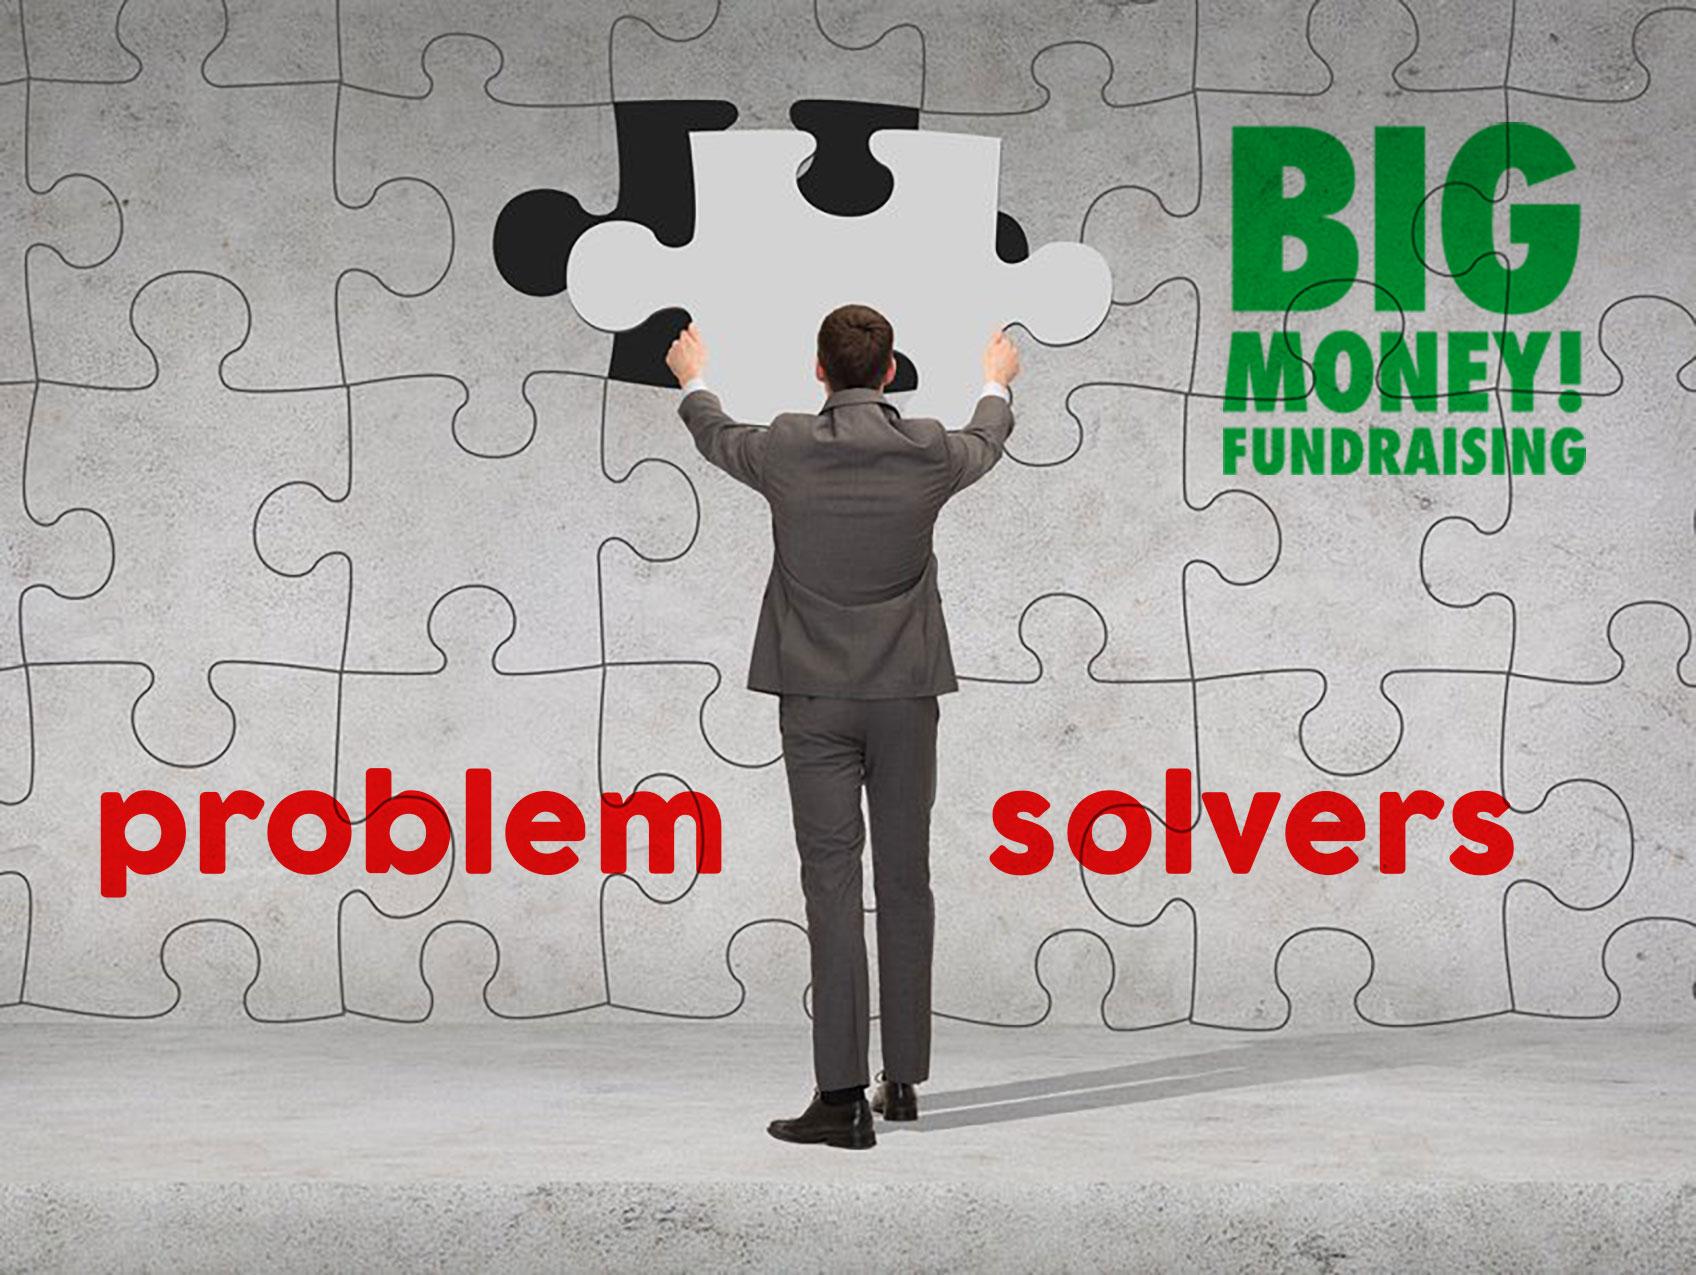 Big Money Fundraising big problem solvers